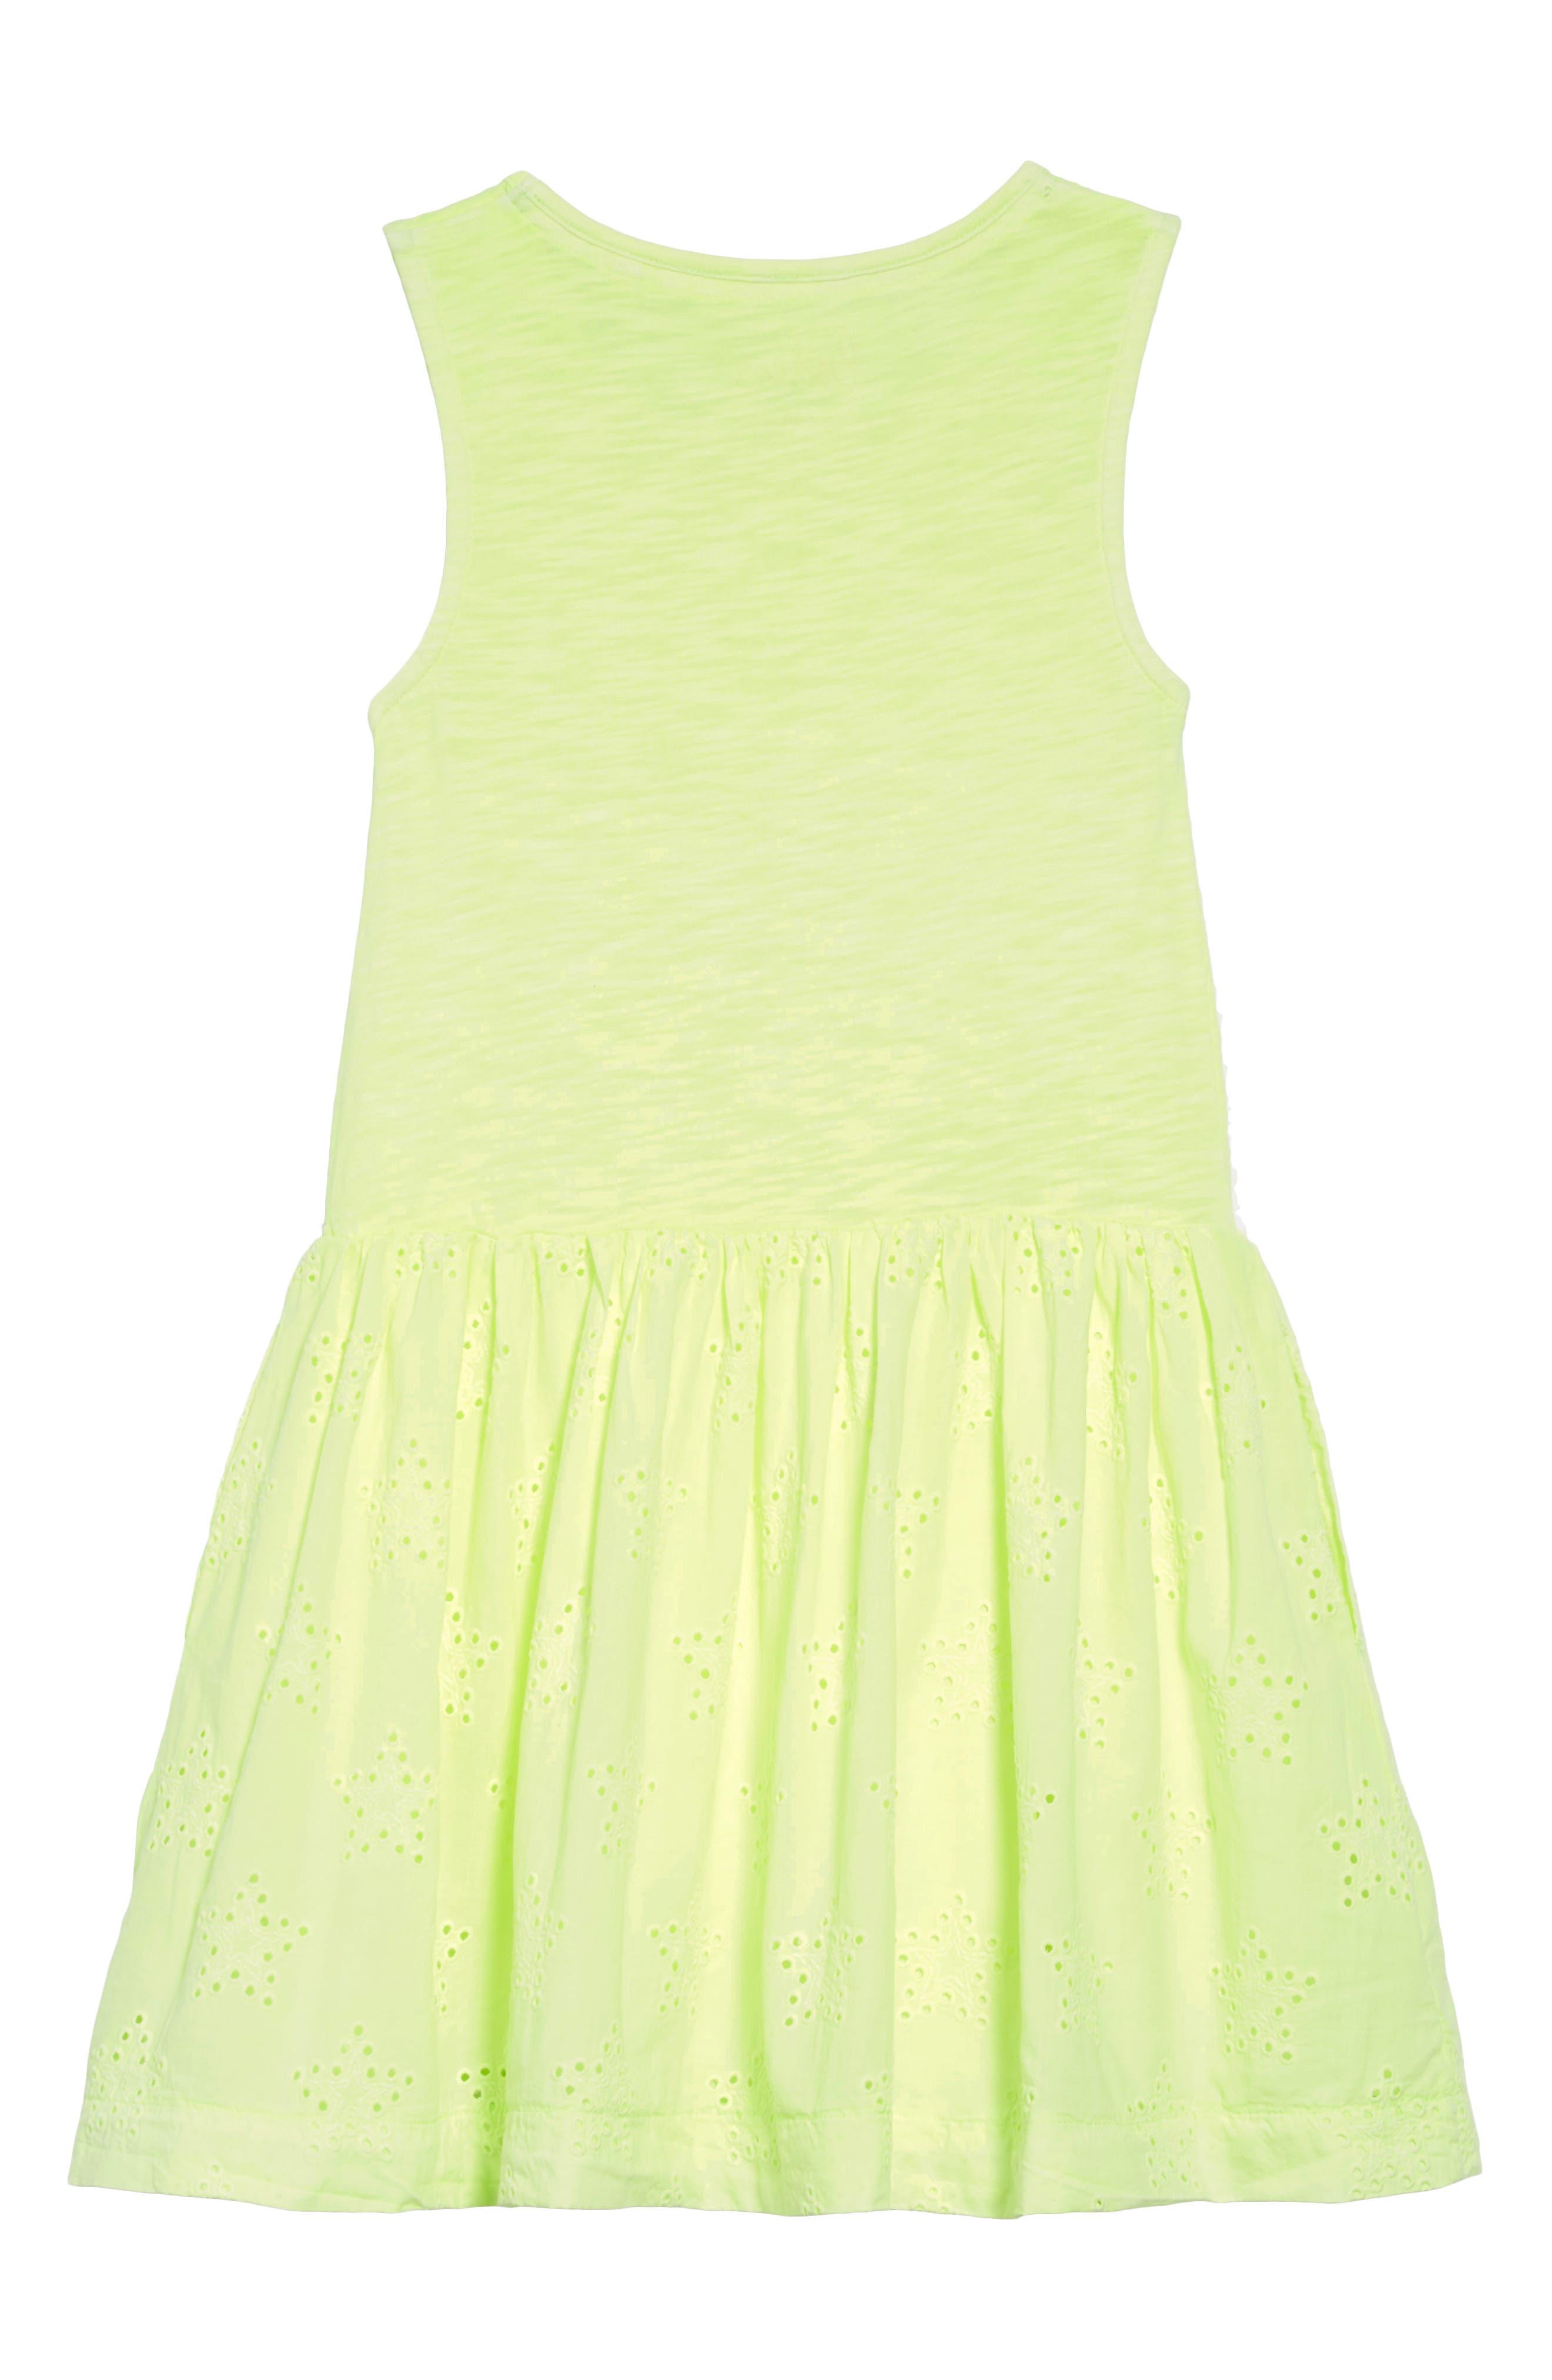 Jersey & Woven Dress,                             Alternate thumbnail 2, color,                             Yelacid Yellow